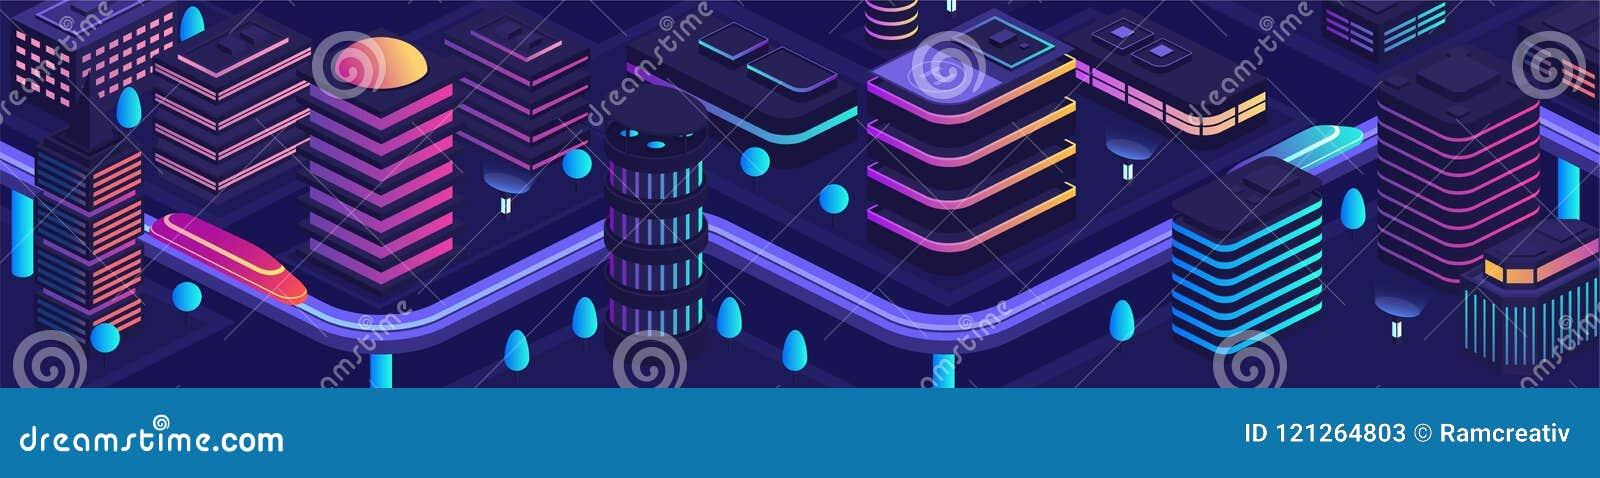 Smart city in futuristic style, city of future. Business center.